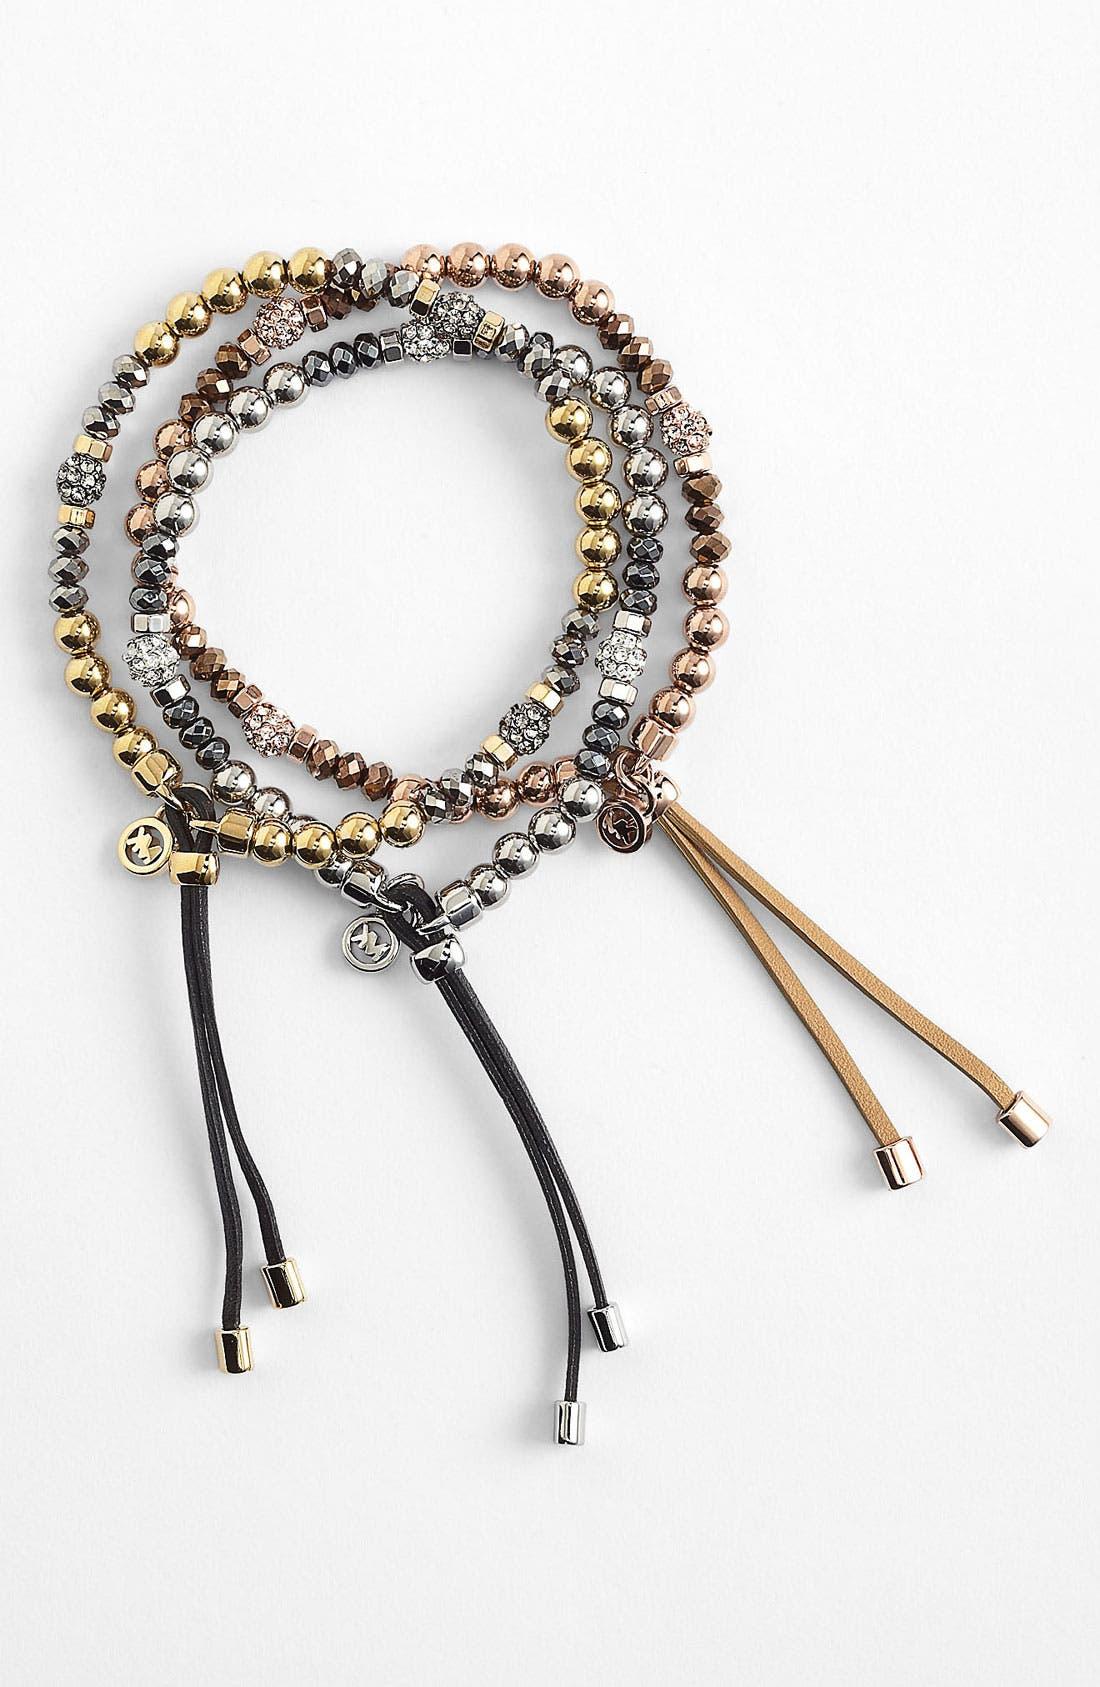 Main Image - Michael Kors 'Brilliance' Stretch Bracelet